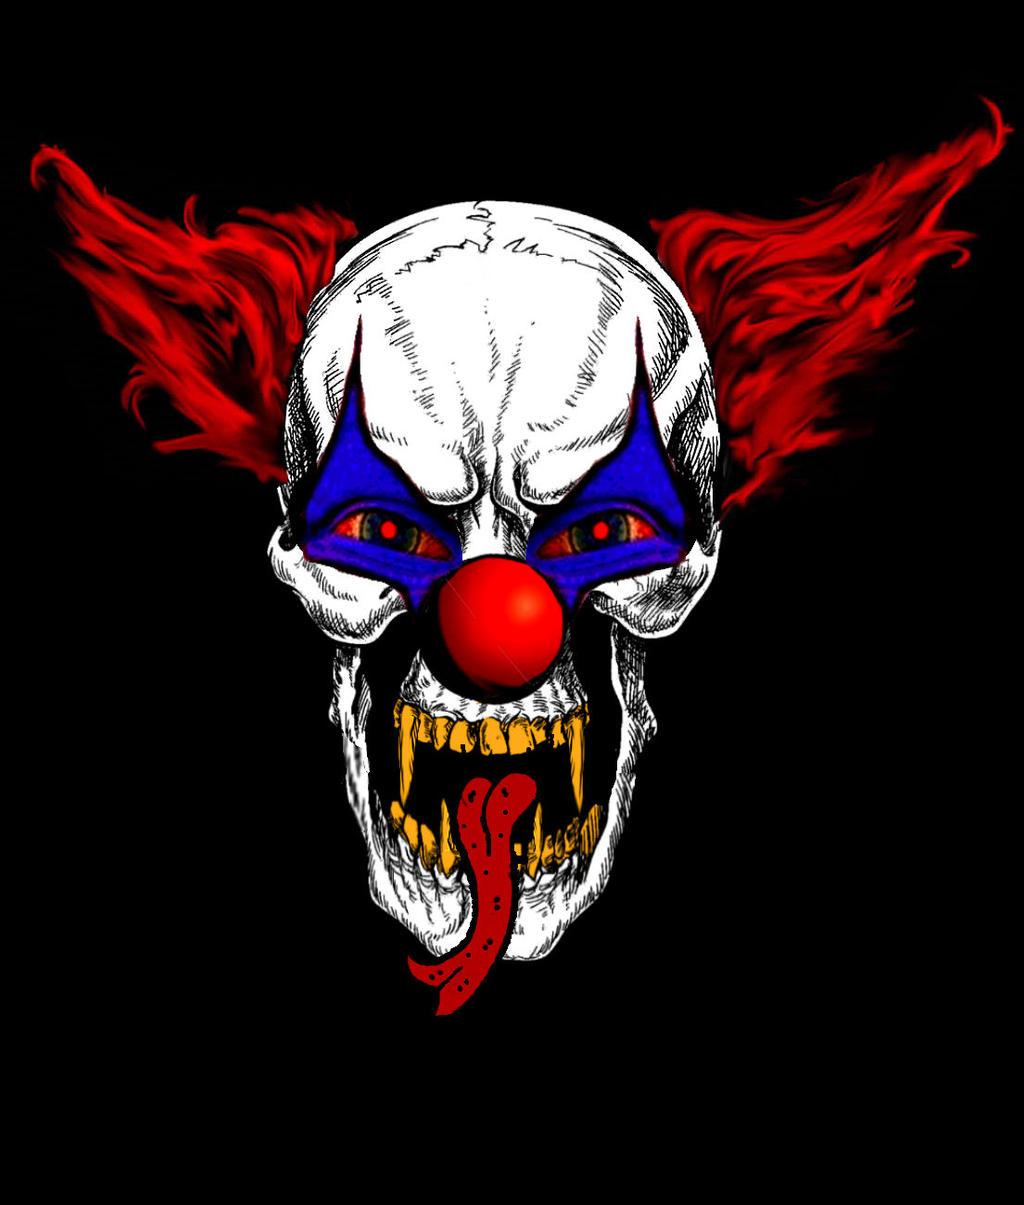 Demon Clown Drawings   www.imgkid.com - The Image Kid Has It!